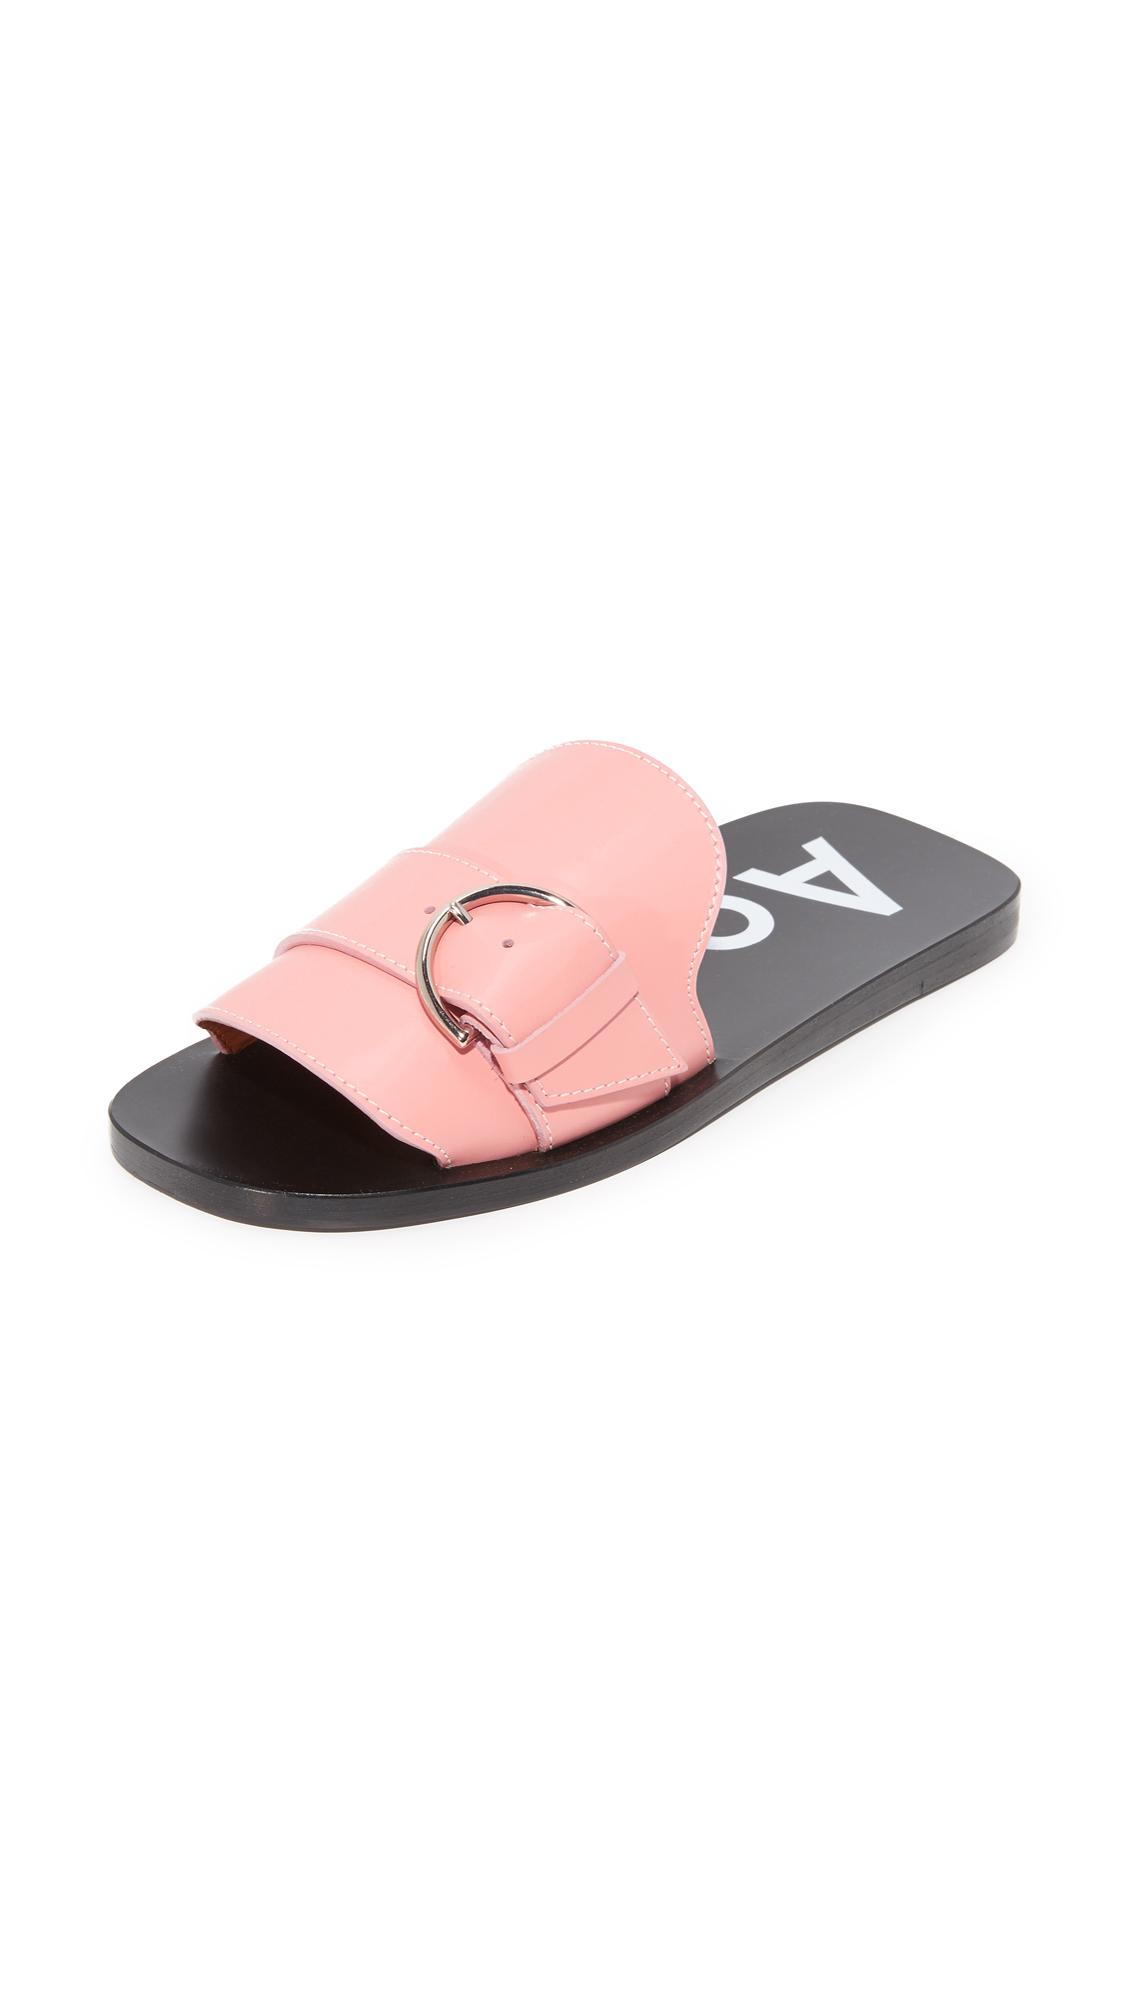 Acne Studios Virgie Slides - Pink/Off White at Shopbop